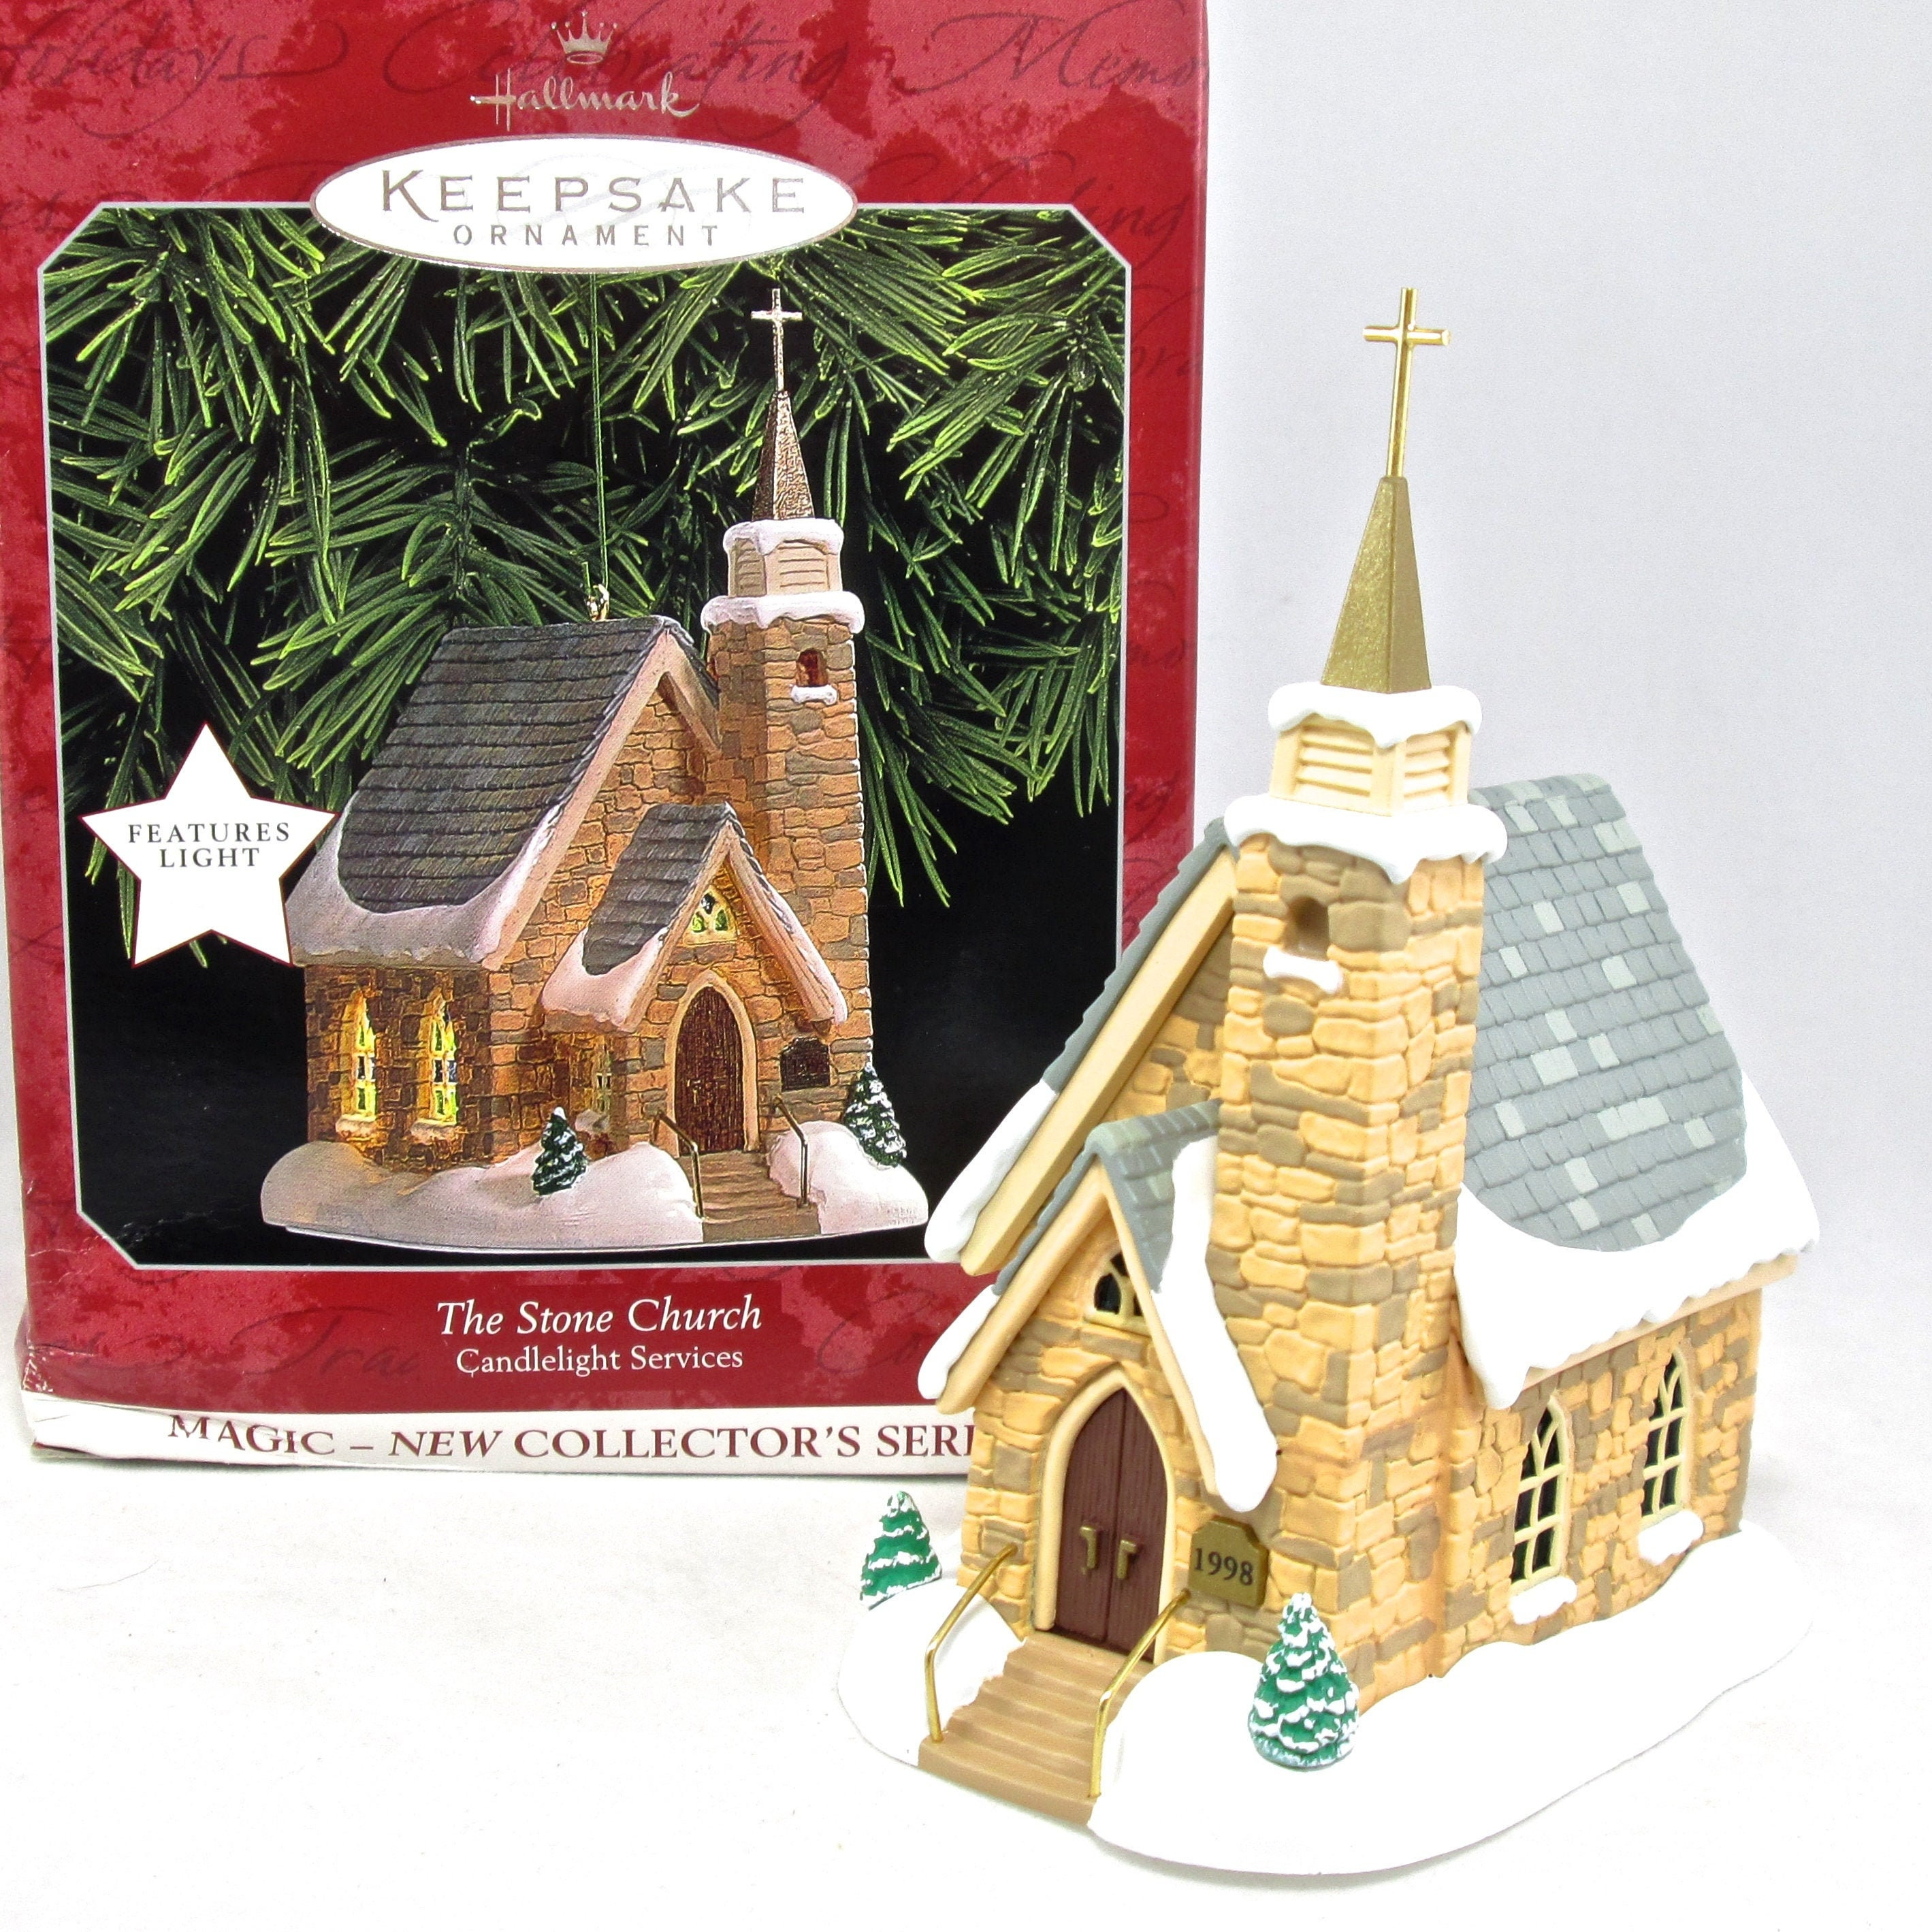 Candlestick 2014 Hallmark A CHRIS MOUSE CHRISTMAS Ornament